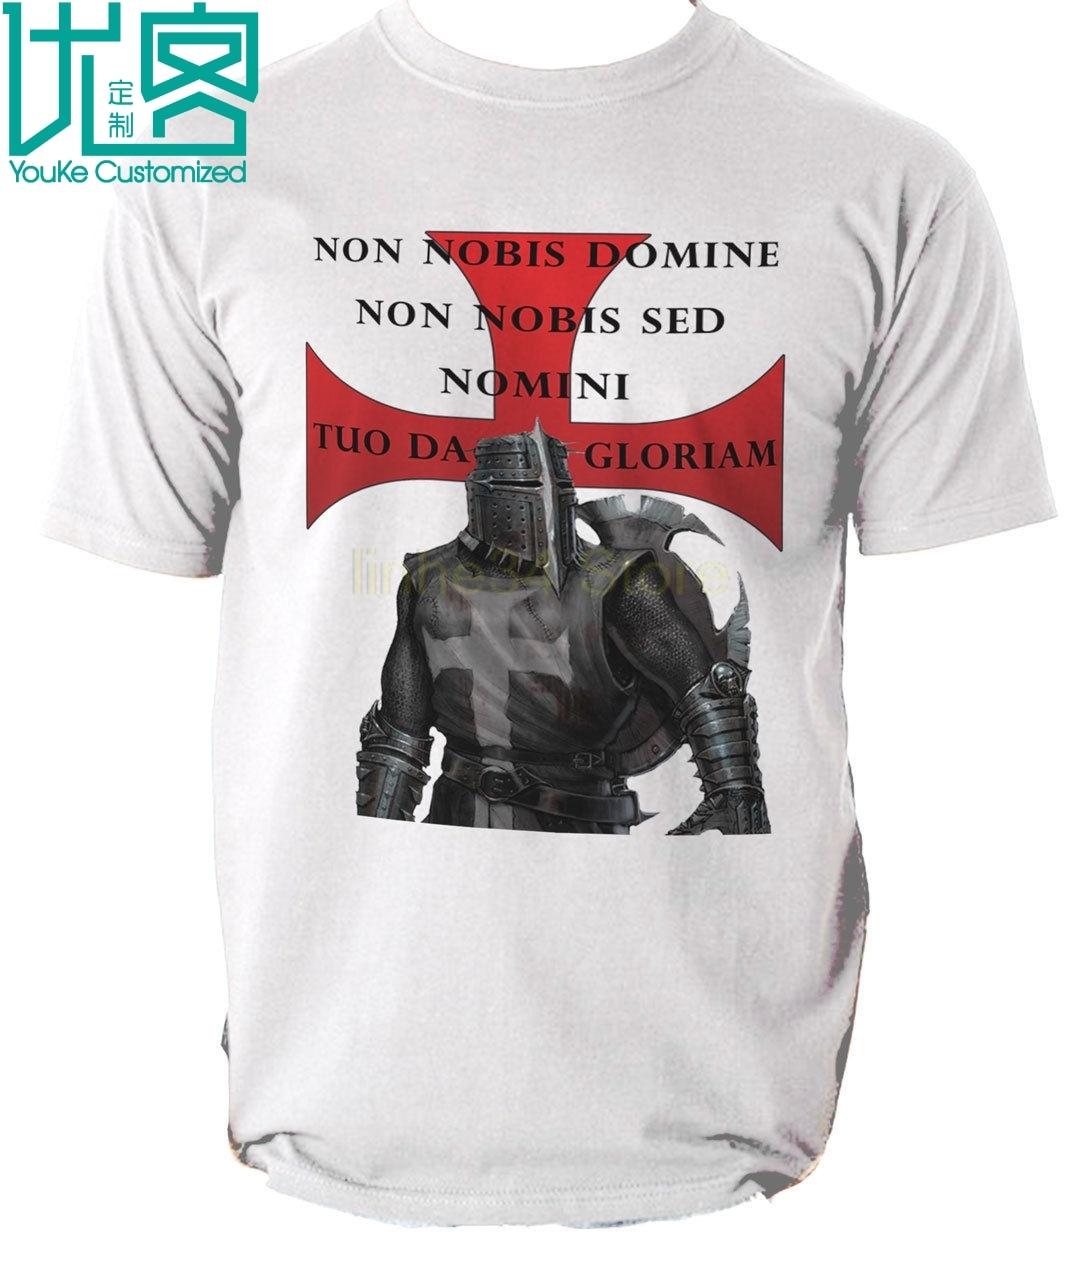 Templarios T camisa caballeros nuevo Caballero Teutónico cruzado Camiseta de algodón